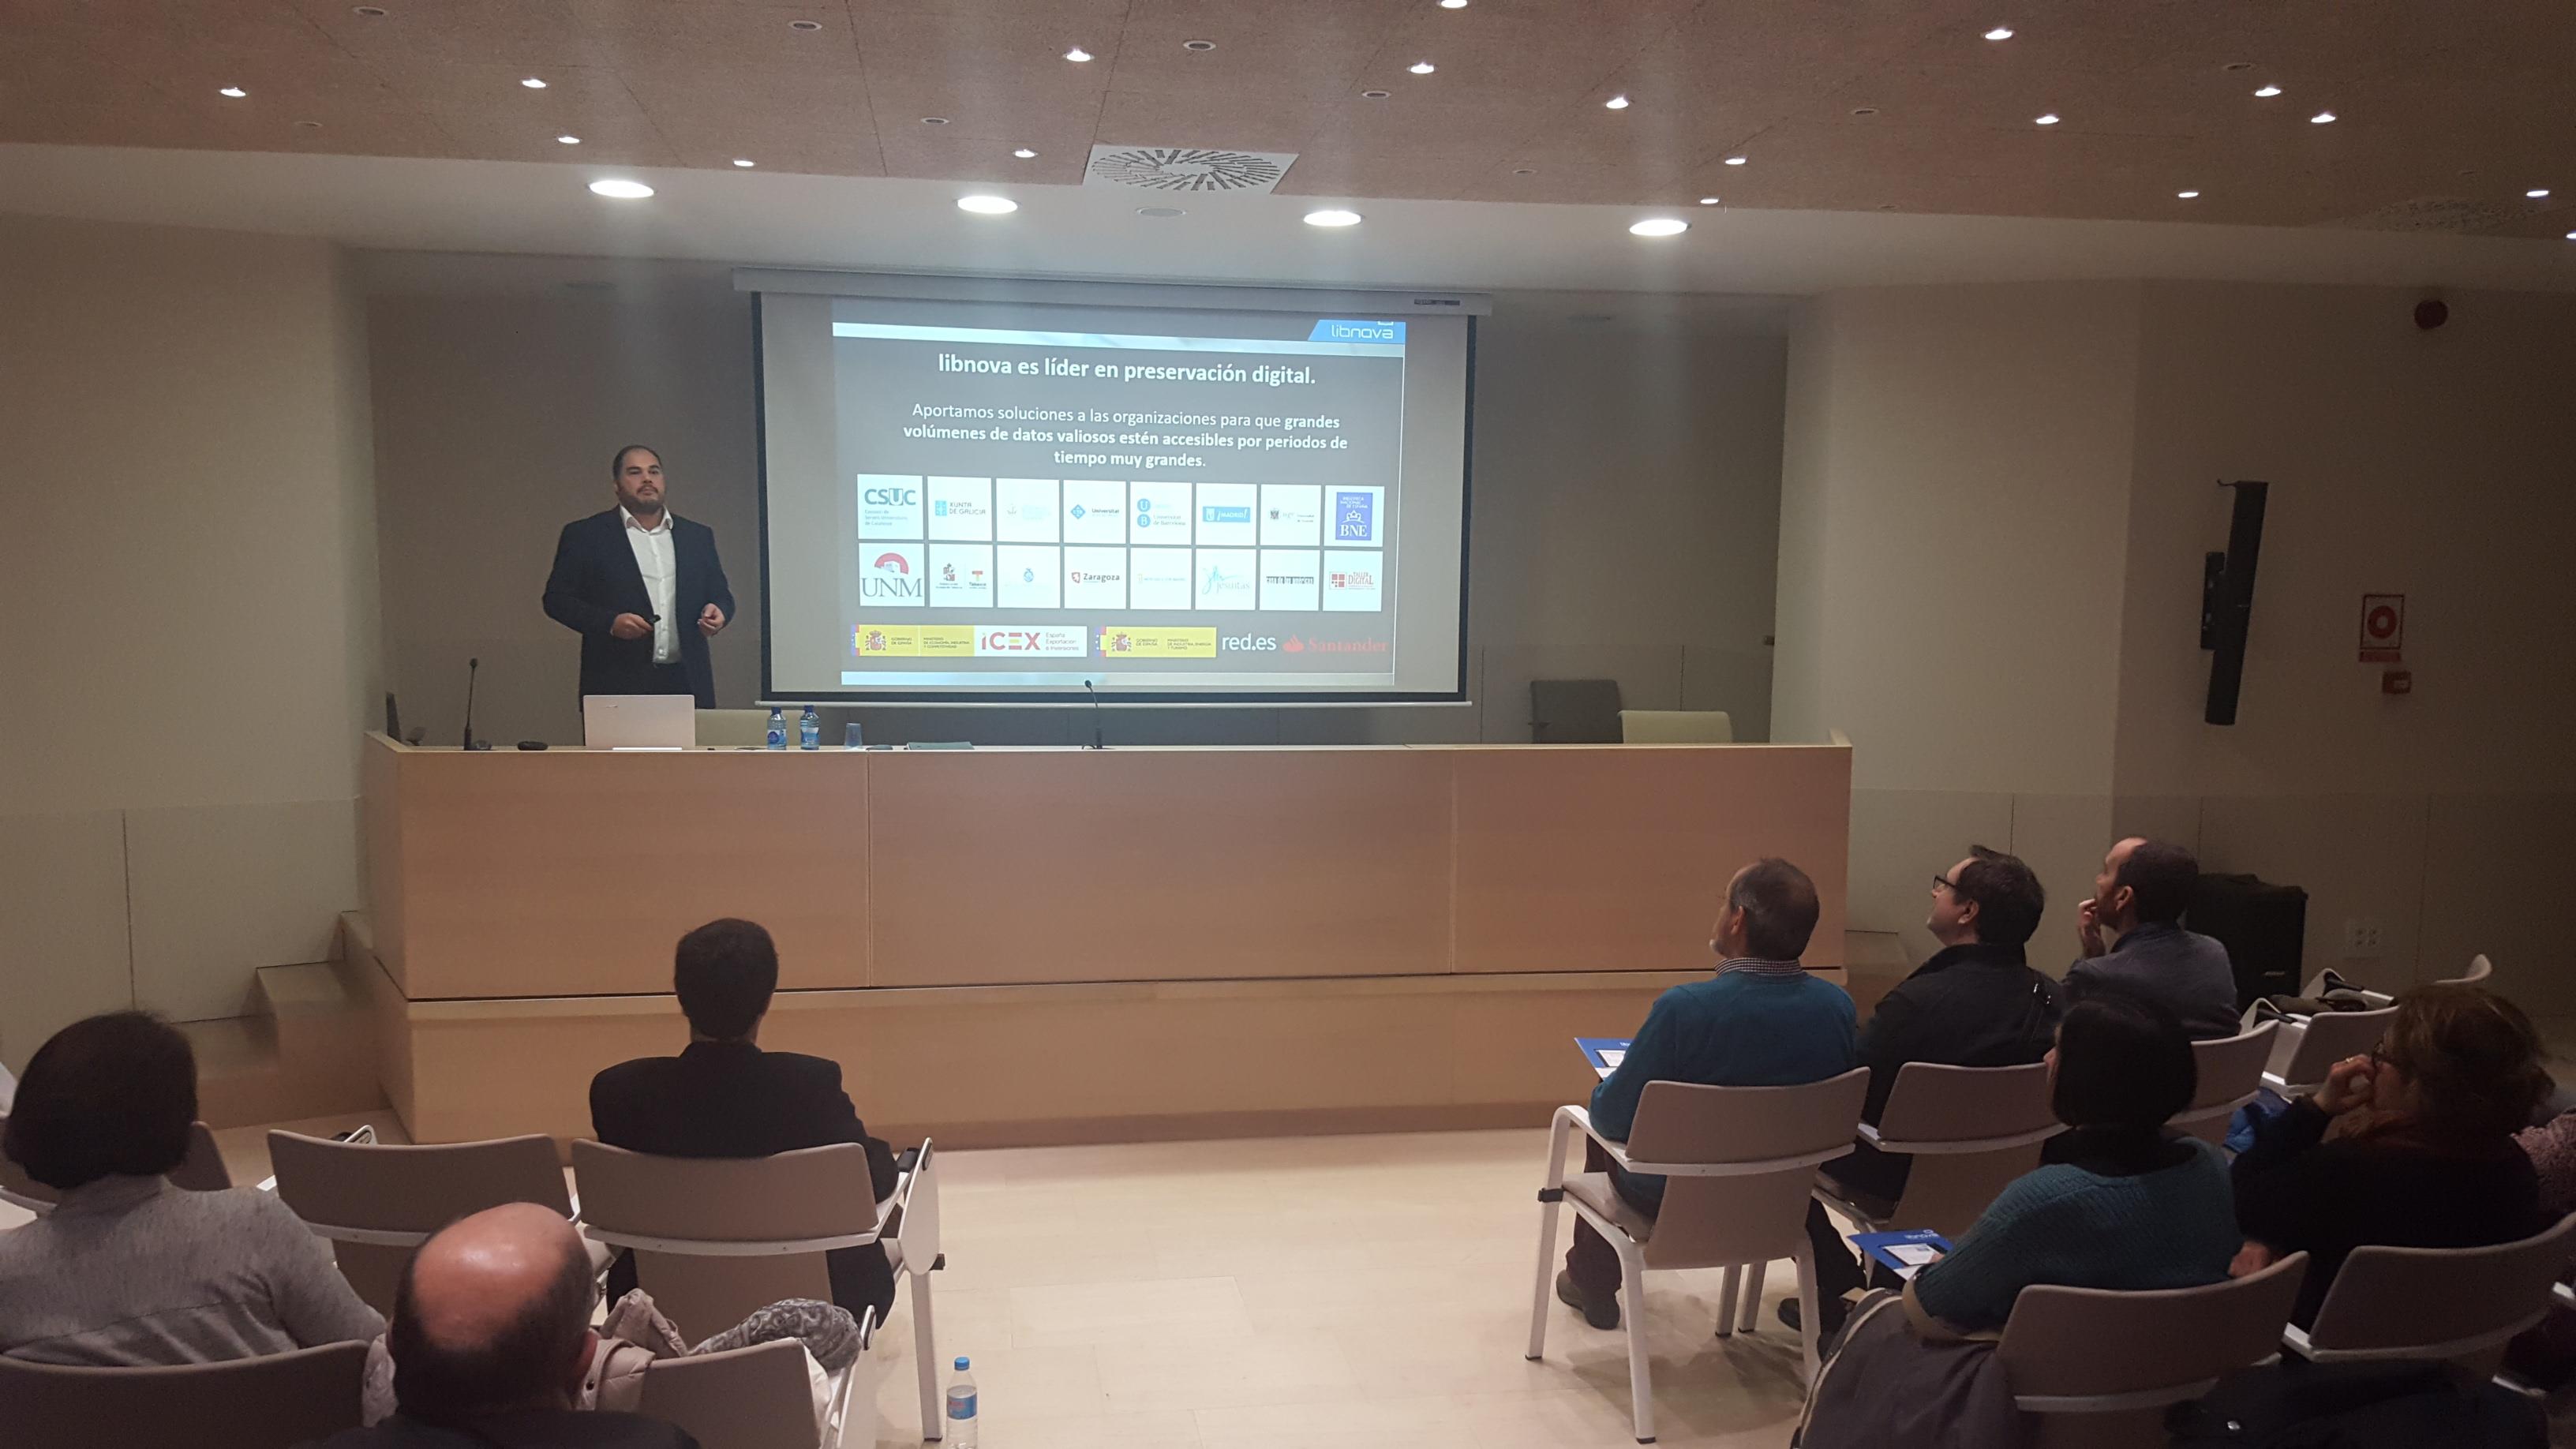 seminario-preservacion-digital-mallorca-libnova-2